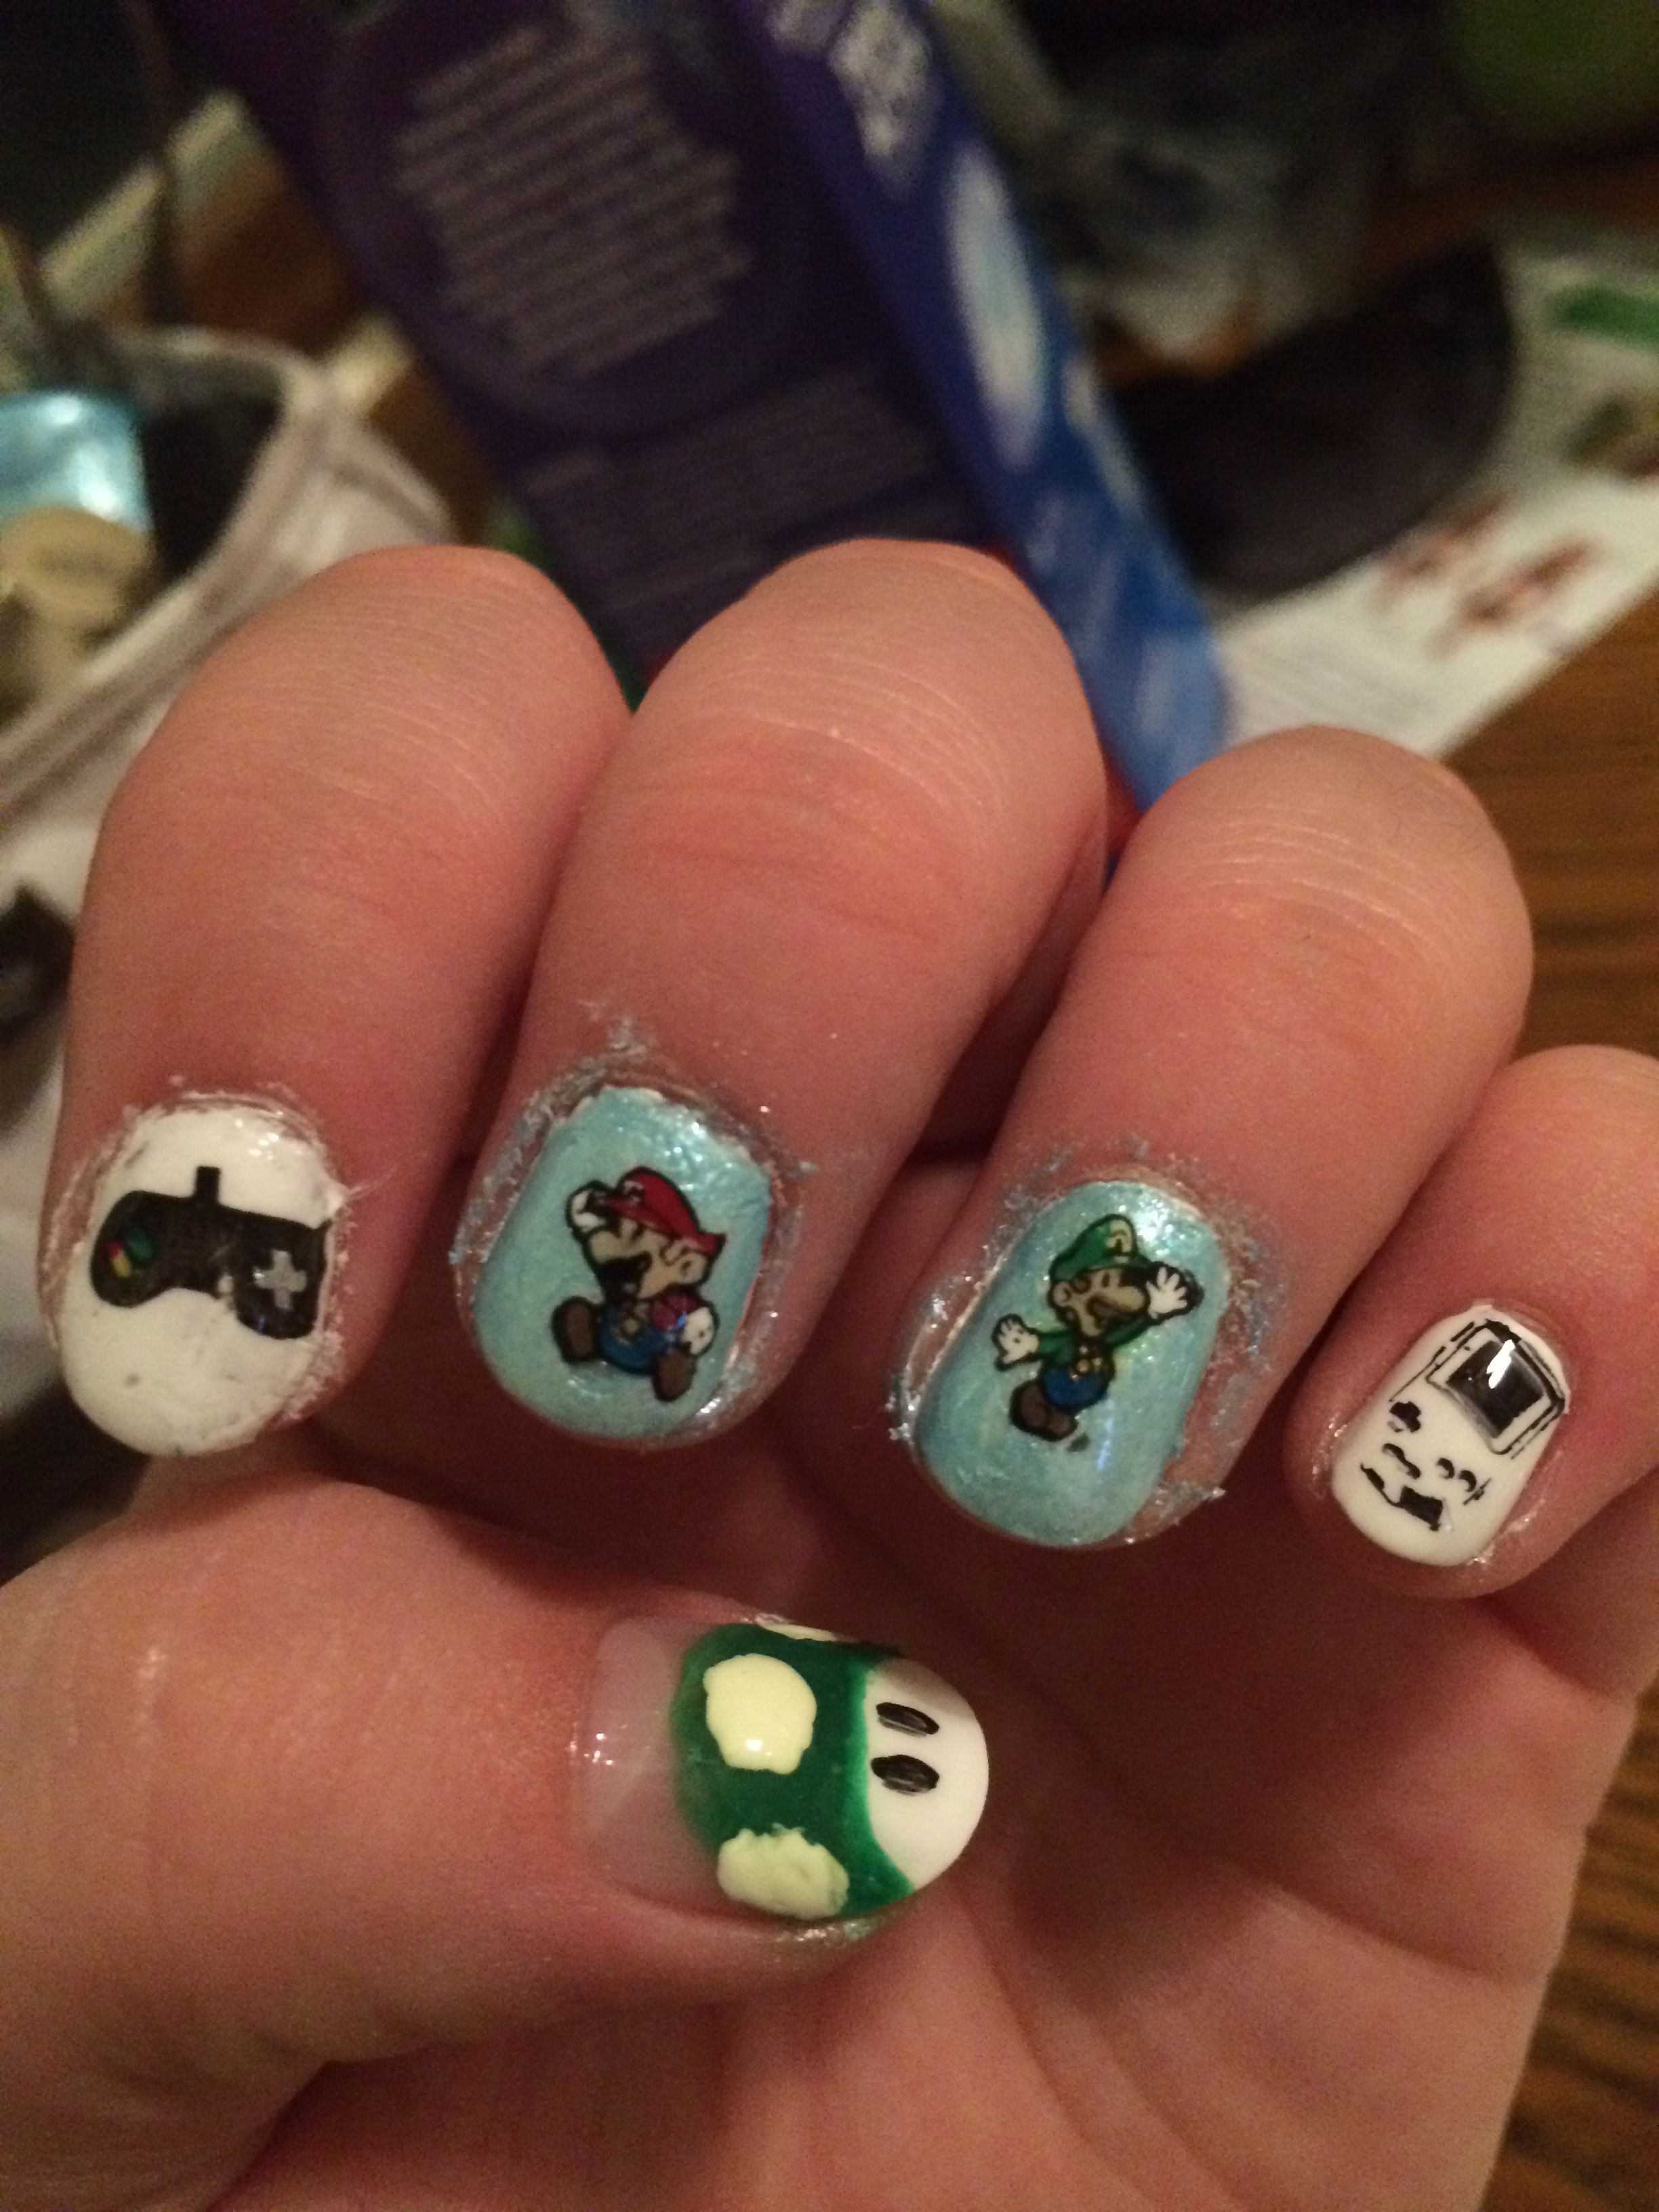 Super Mario nail art! Done using a Konad stamper and scraper kit ...